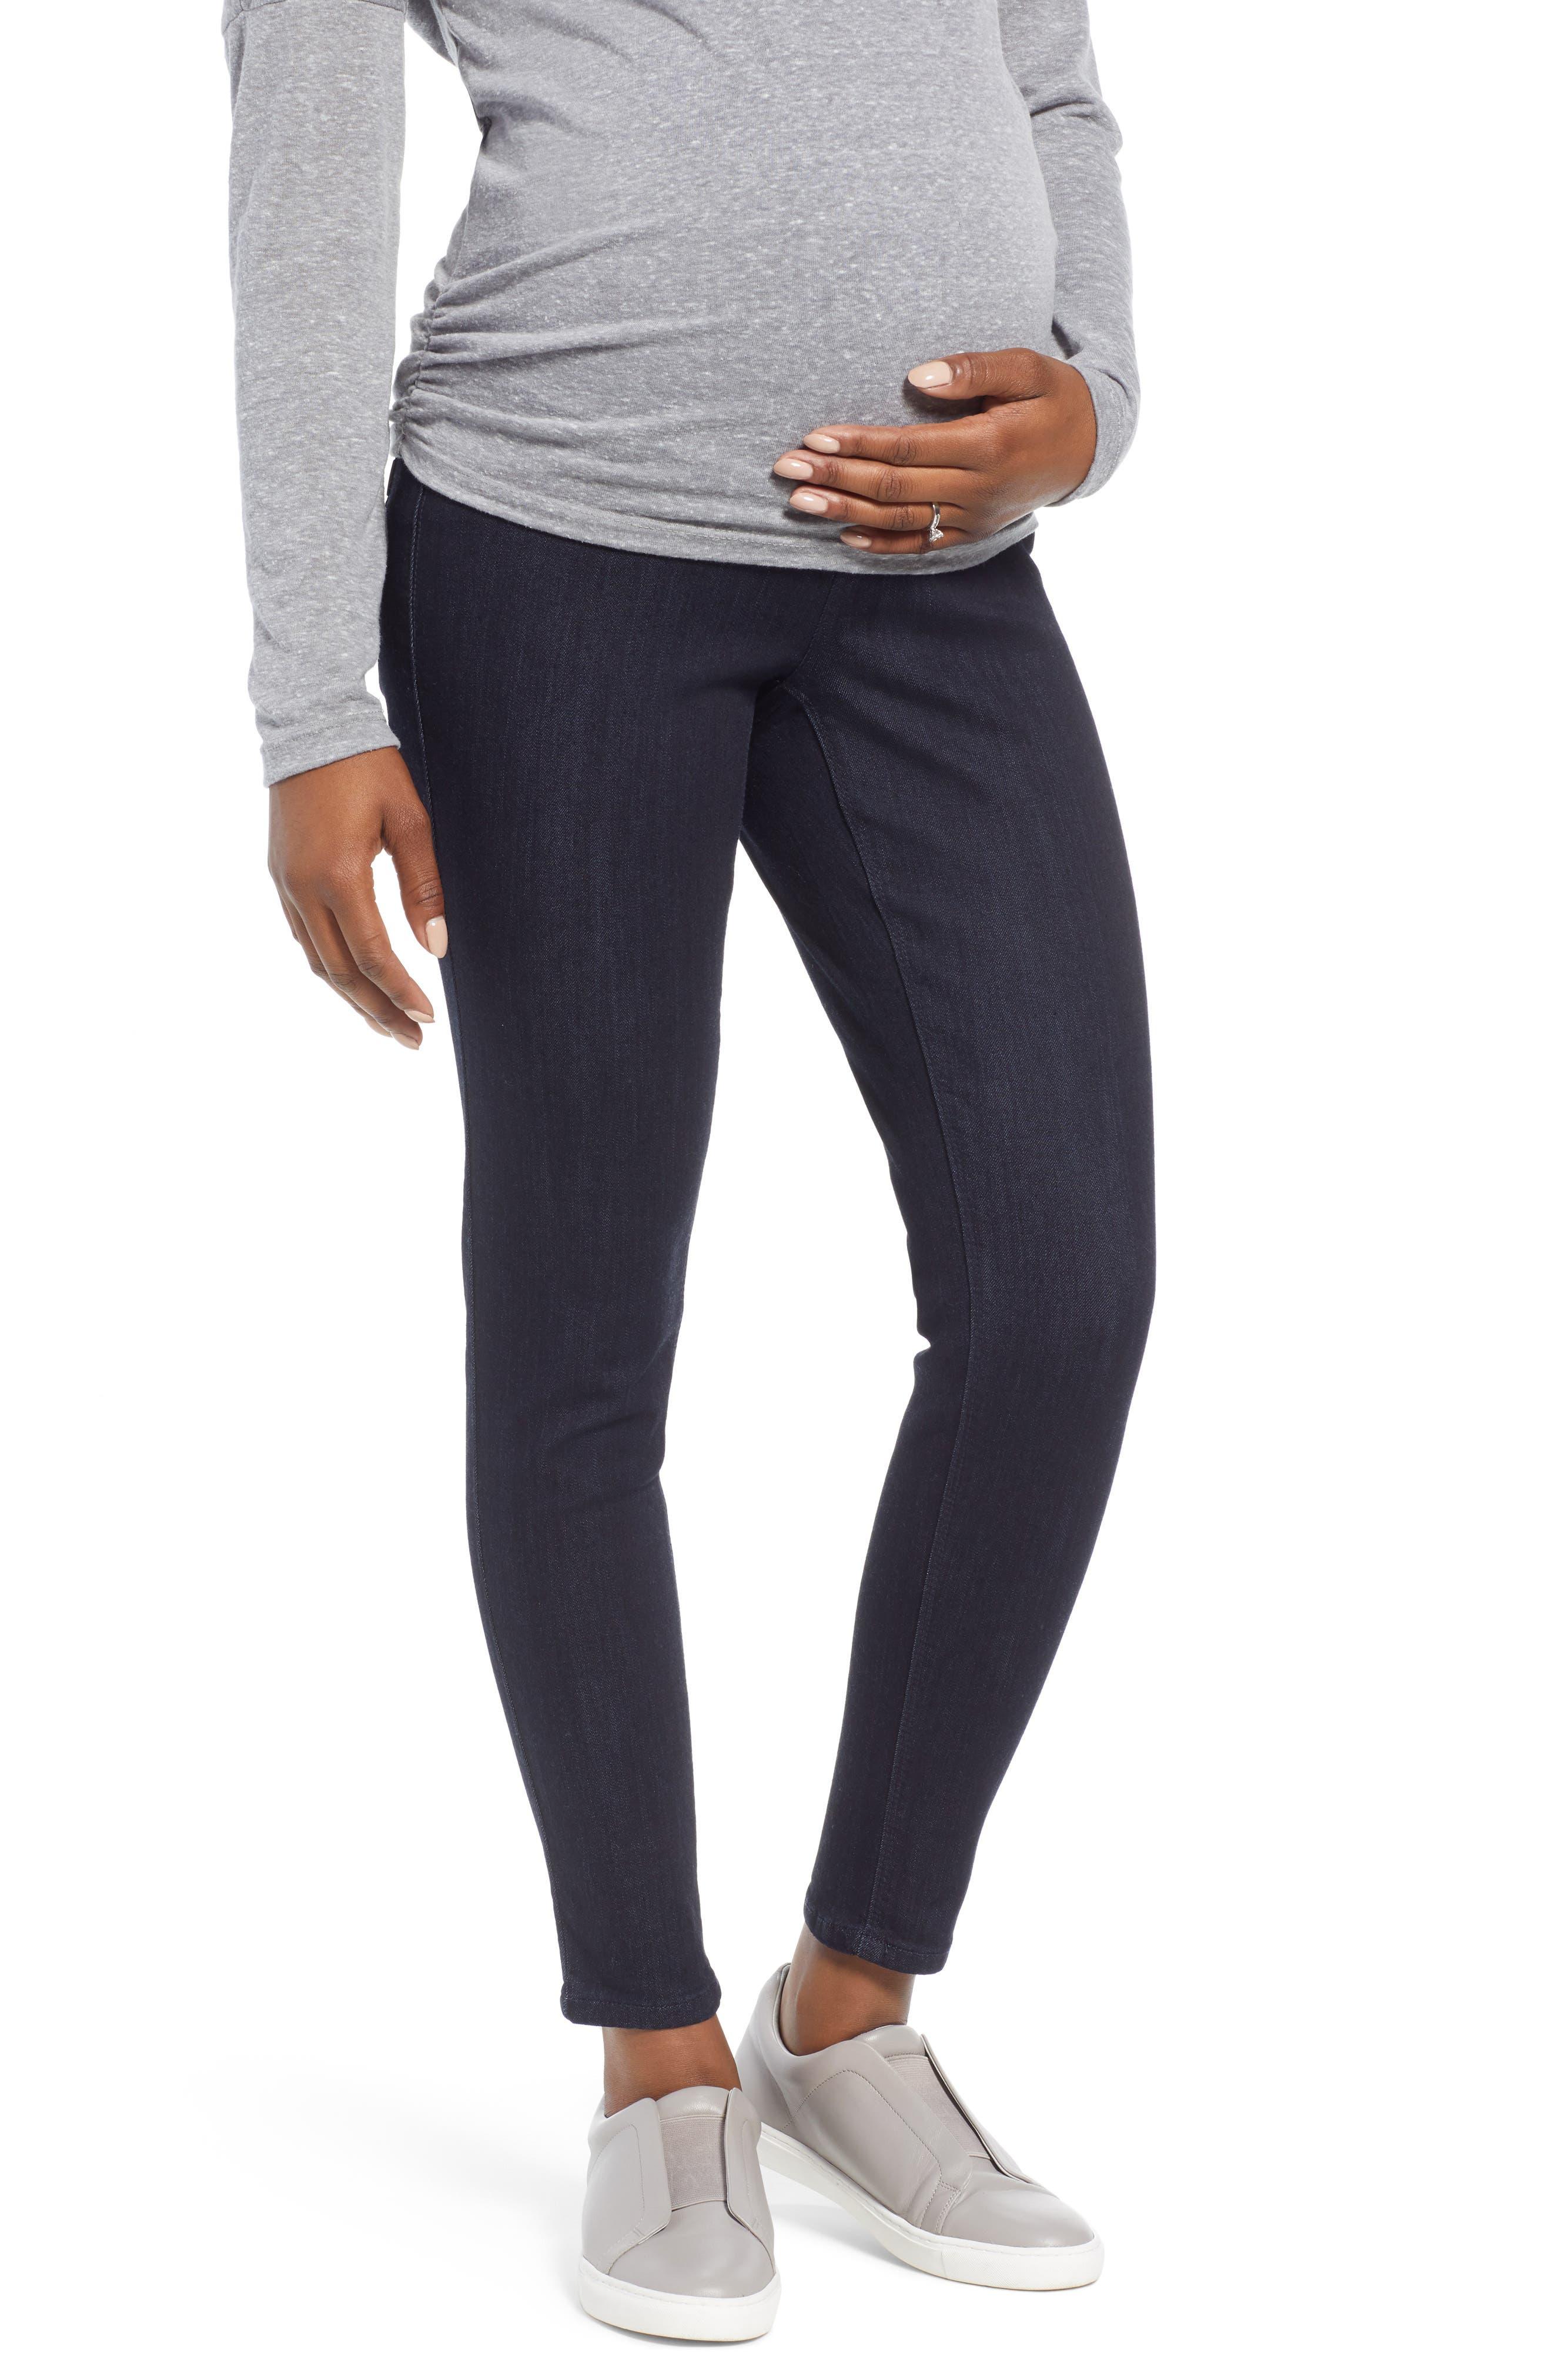 Women's 1822 Denim Ankle Skinny Maternity Jeans